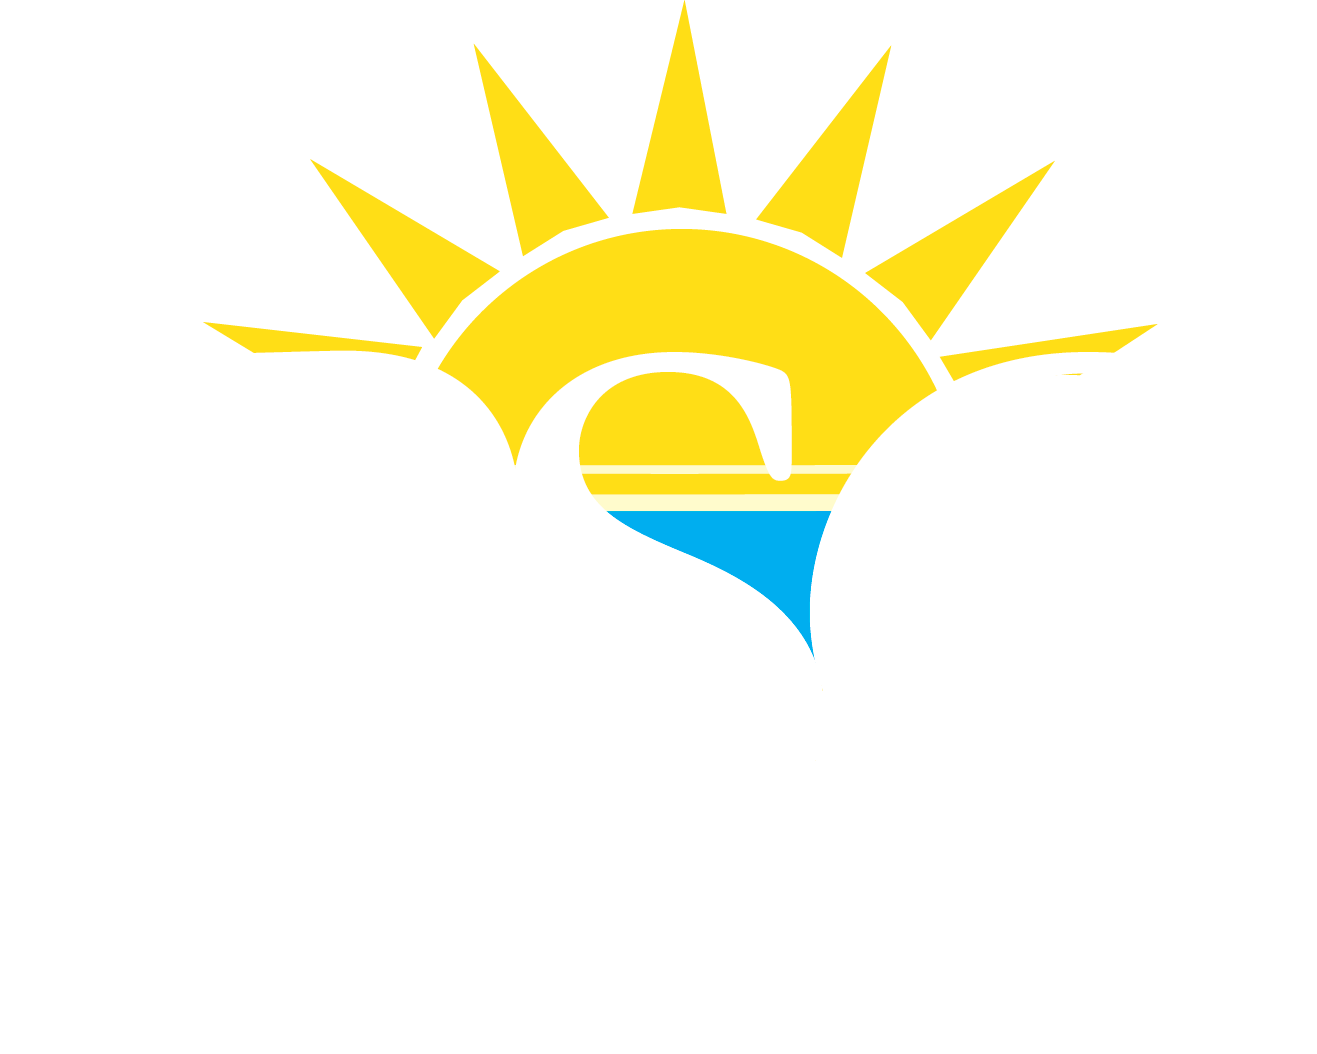 decorative image of PSC_VertLogo1_KO_CMYK_o34b4w , Branding 2016-09-08 20:27:10